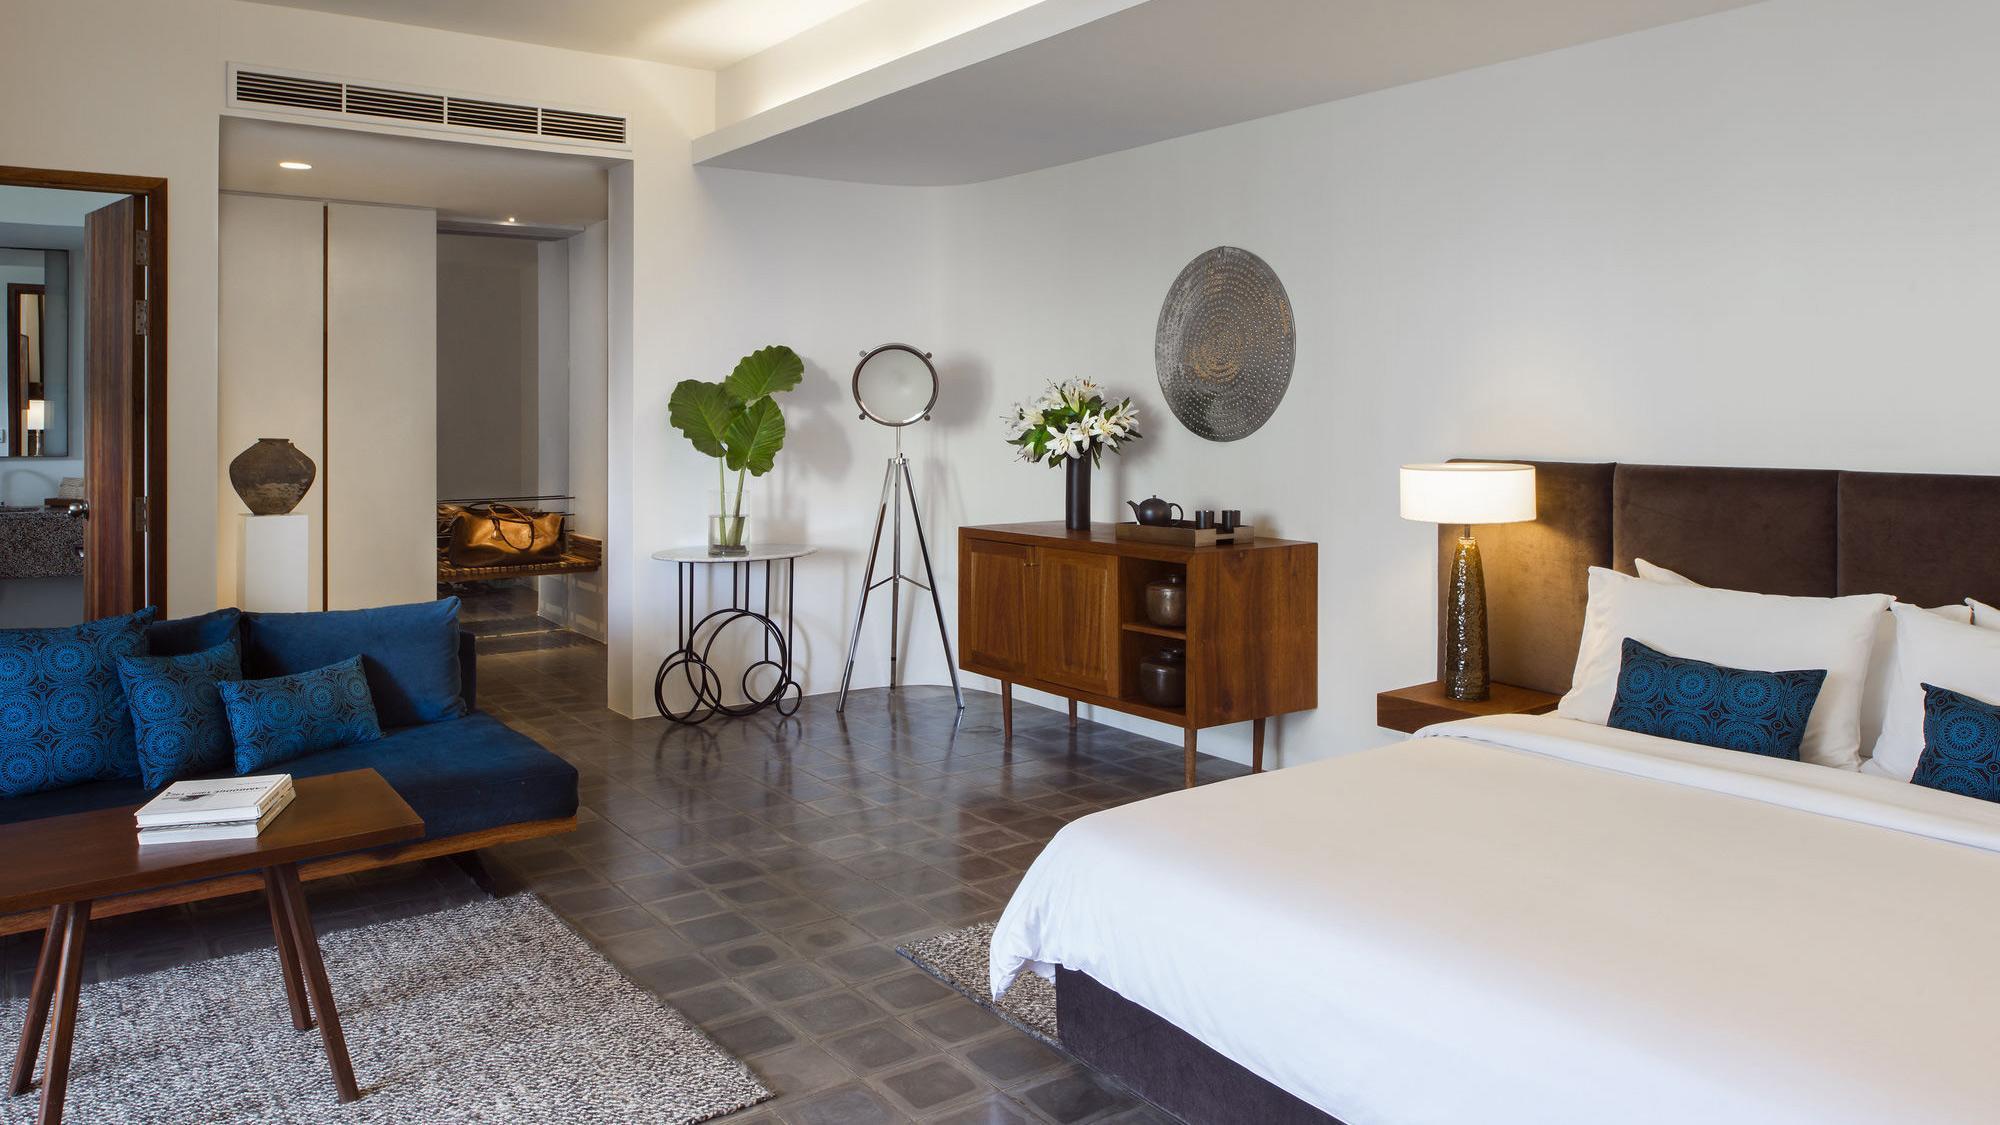 Viroth's Hotelin Cambodia Viroth's Hotelin Cambodia TheViroth's Hotelin Cambodia is the Best Hotel in the World 2018 viroths hotel siem reap suite room